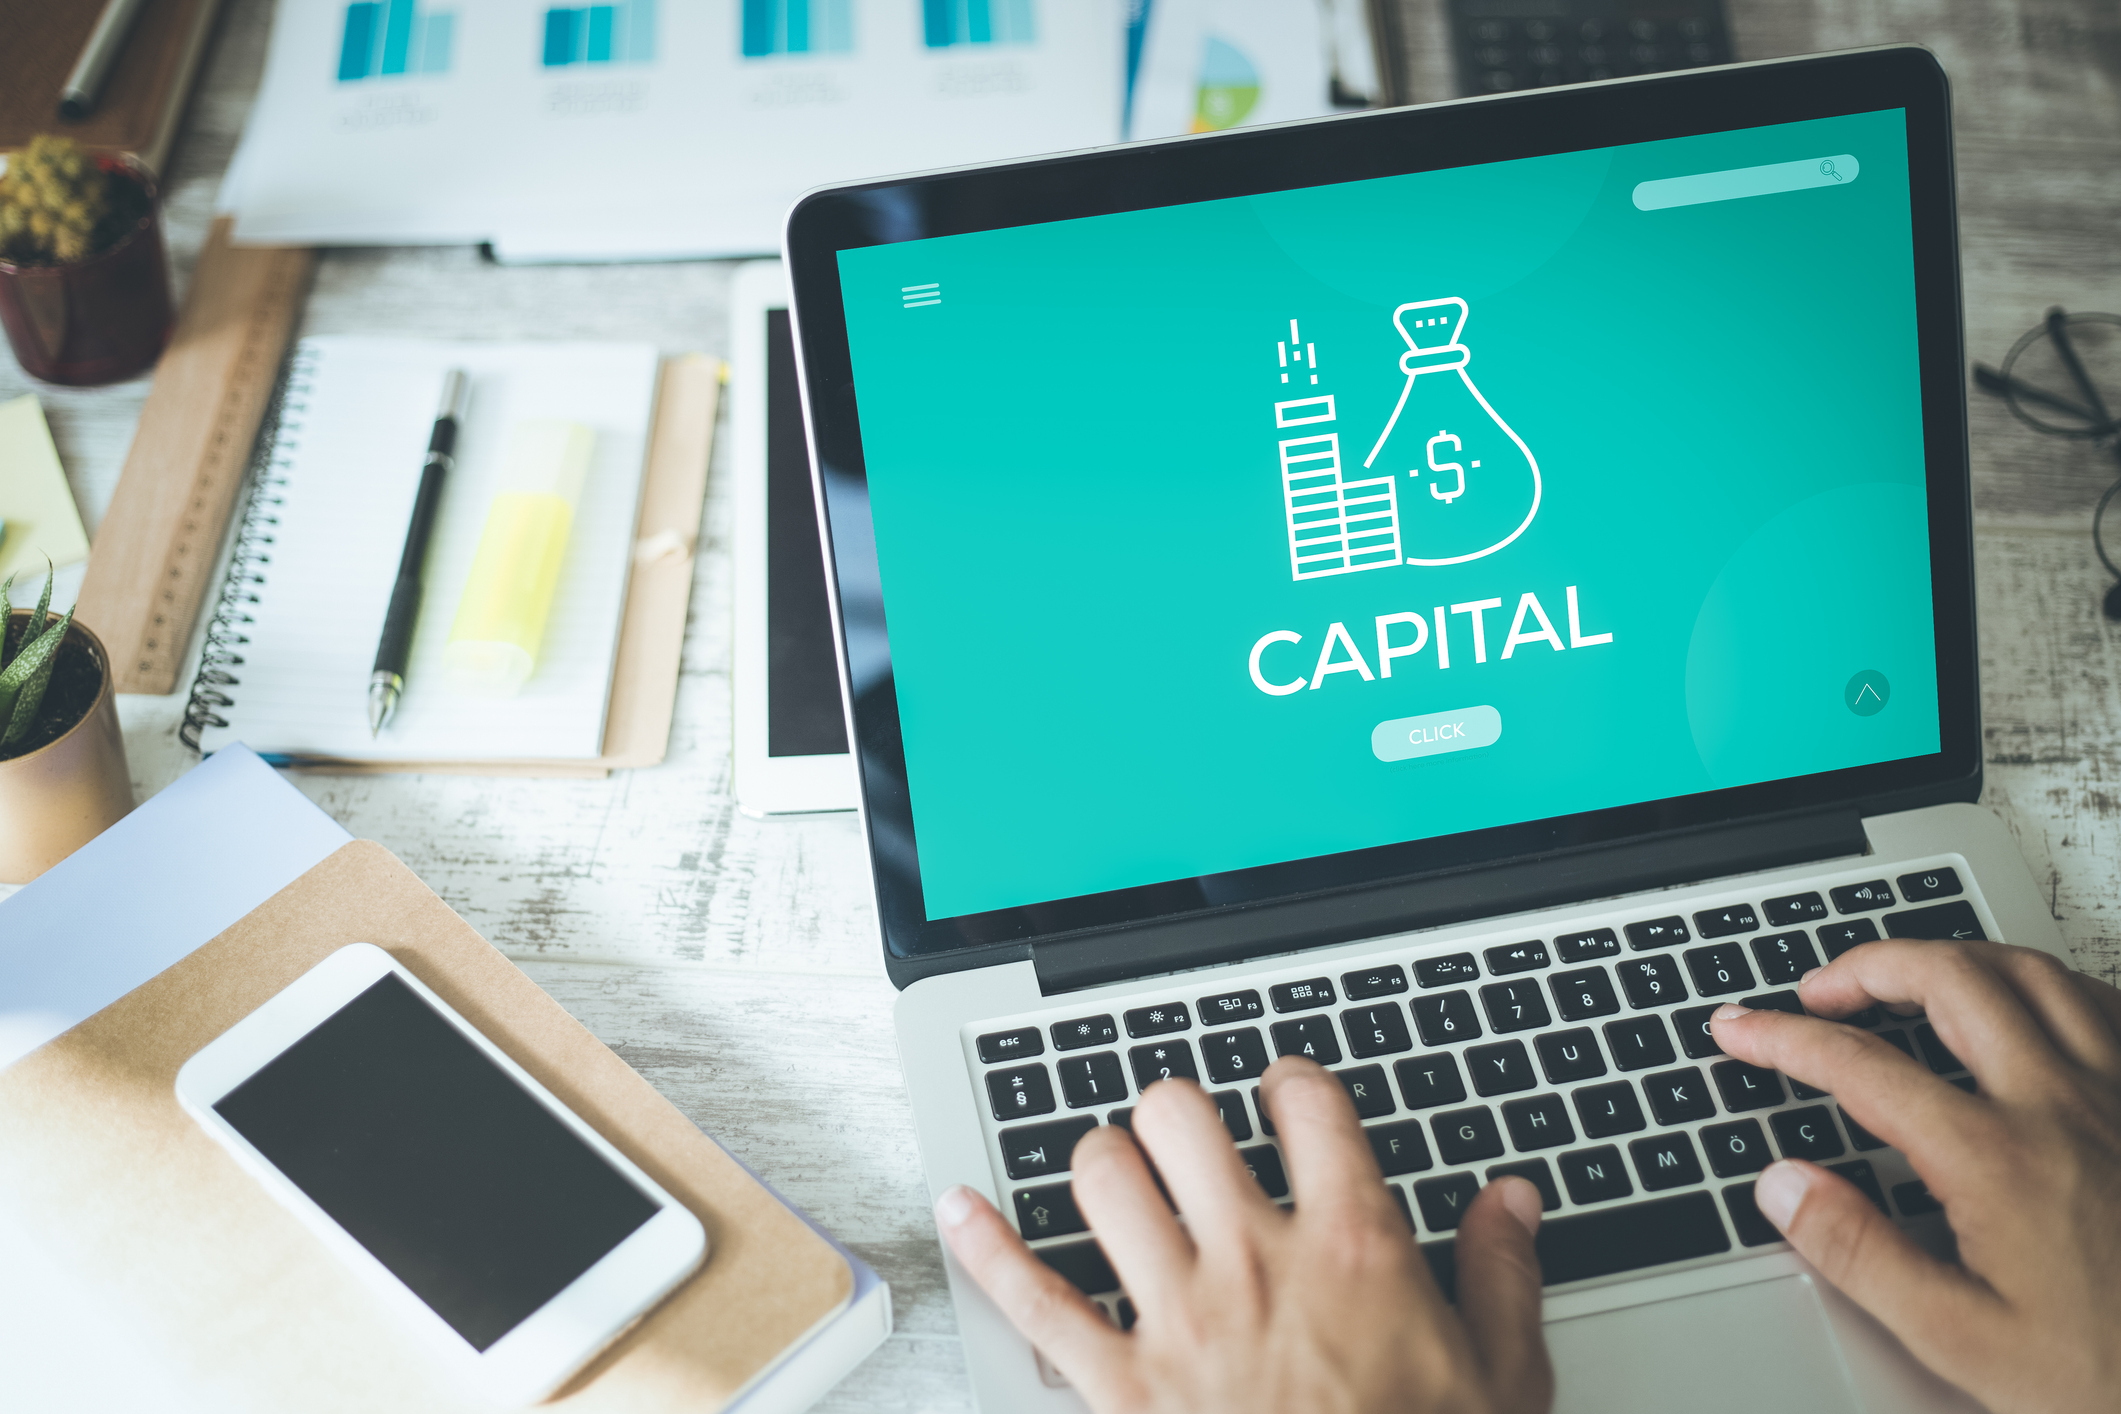 Costo Capital